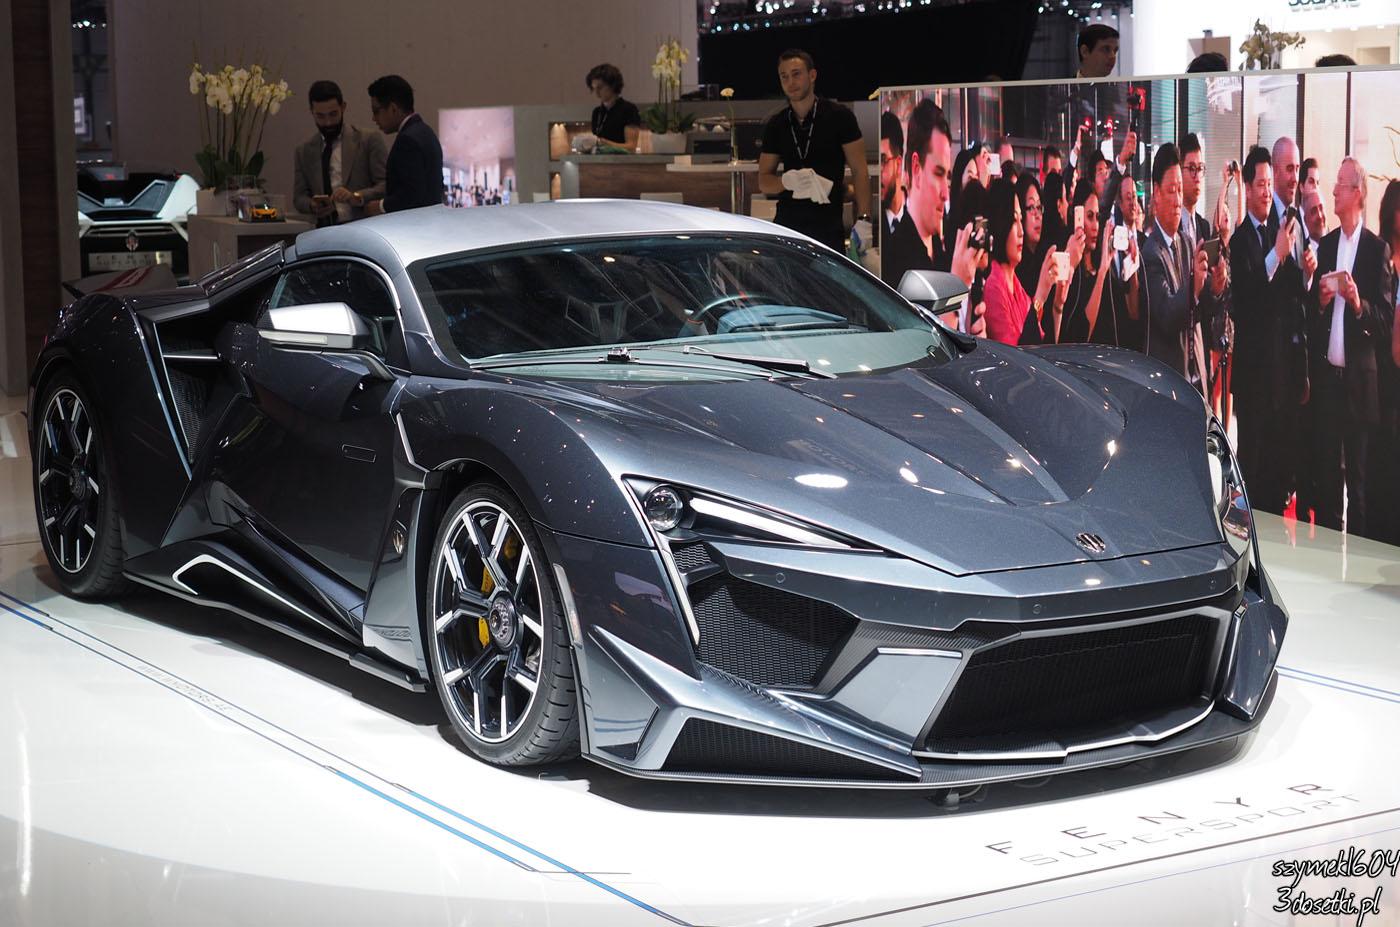 Geneva motor show 2018 relacja - Geneva motor show ...